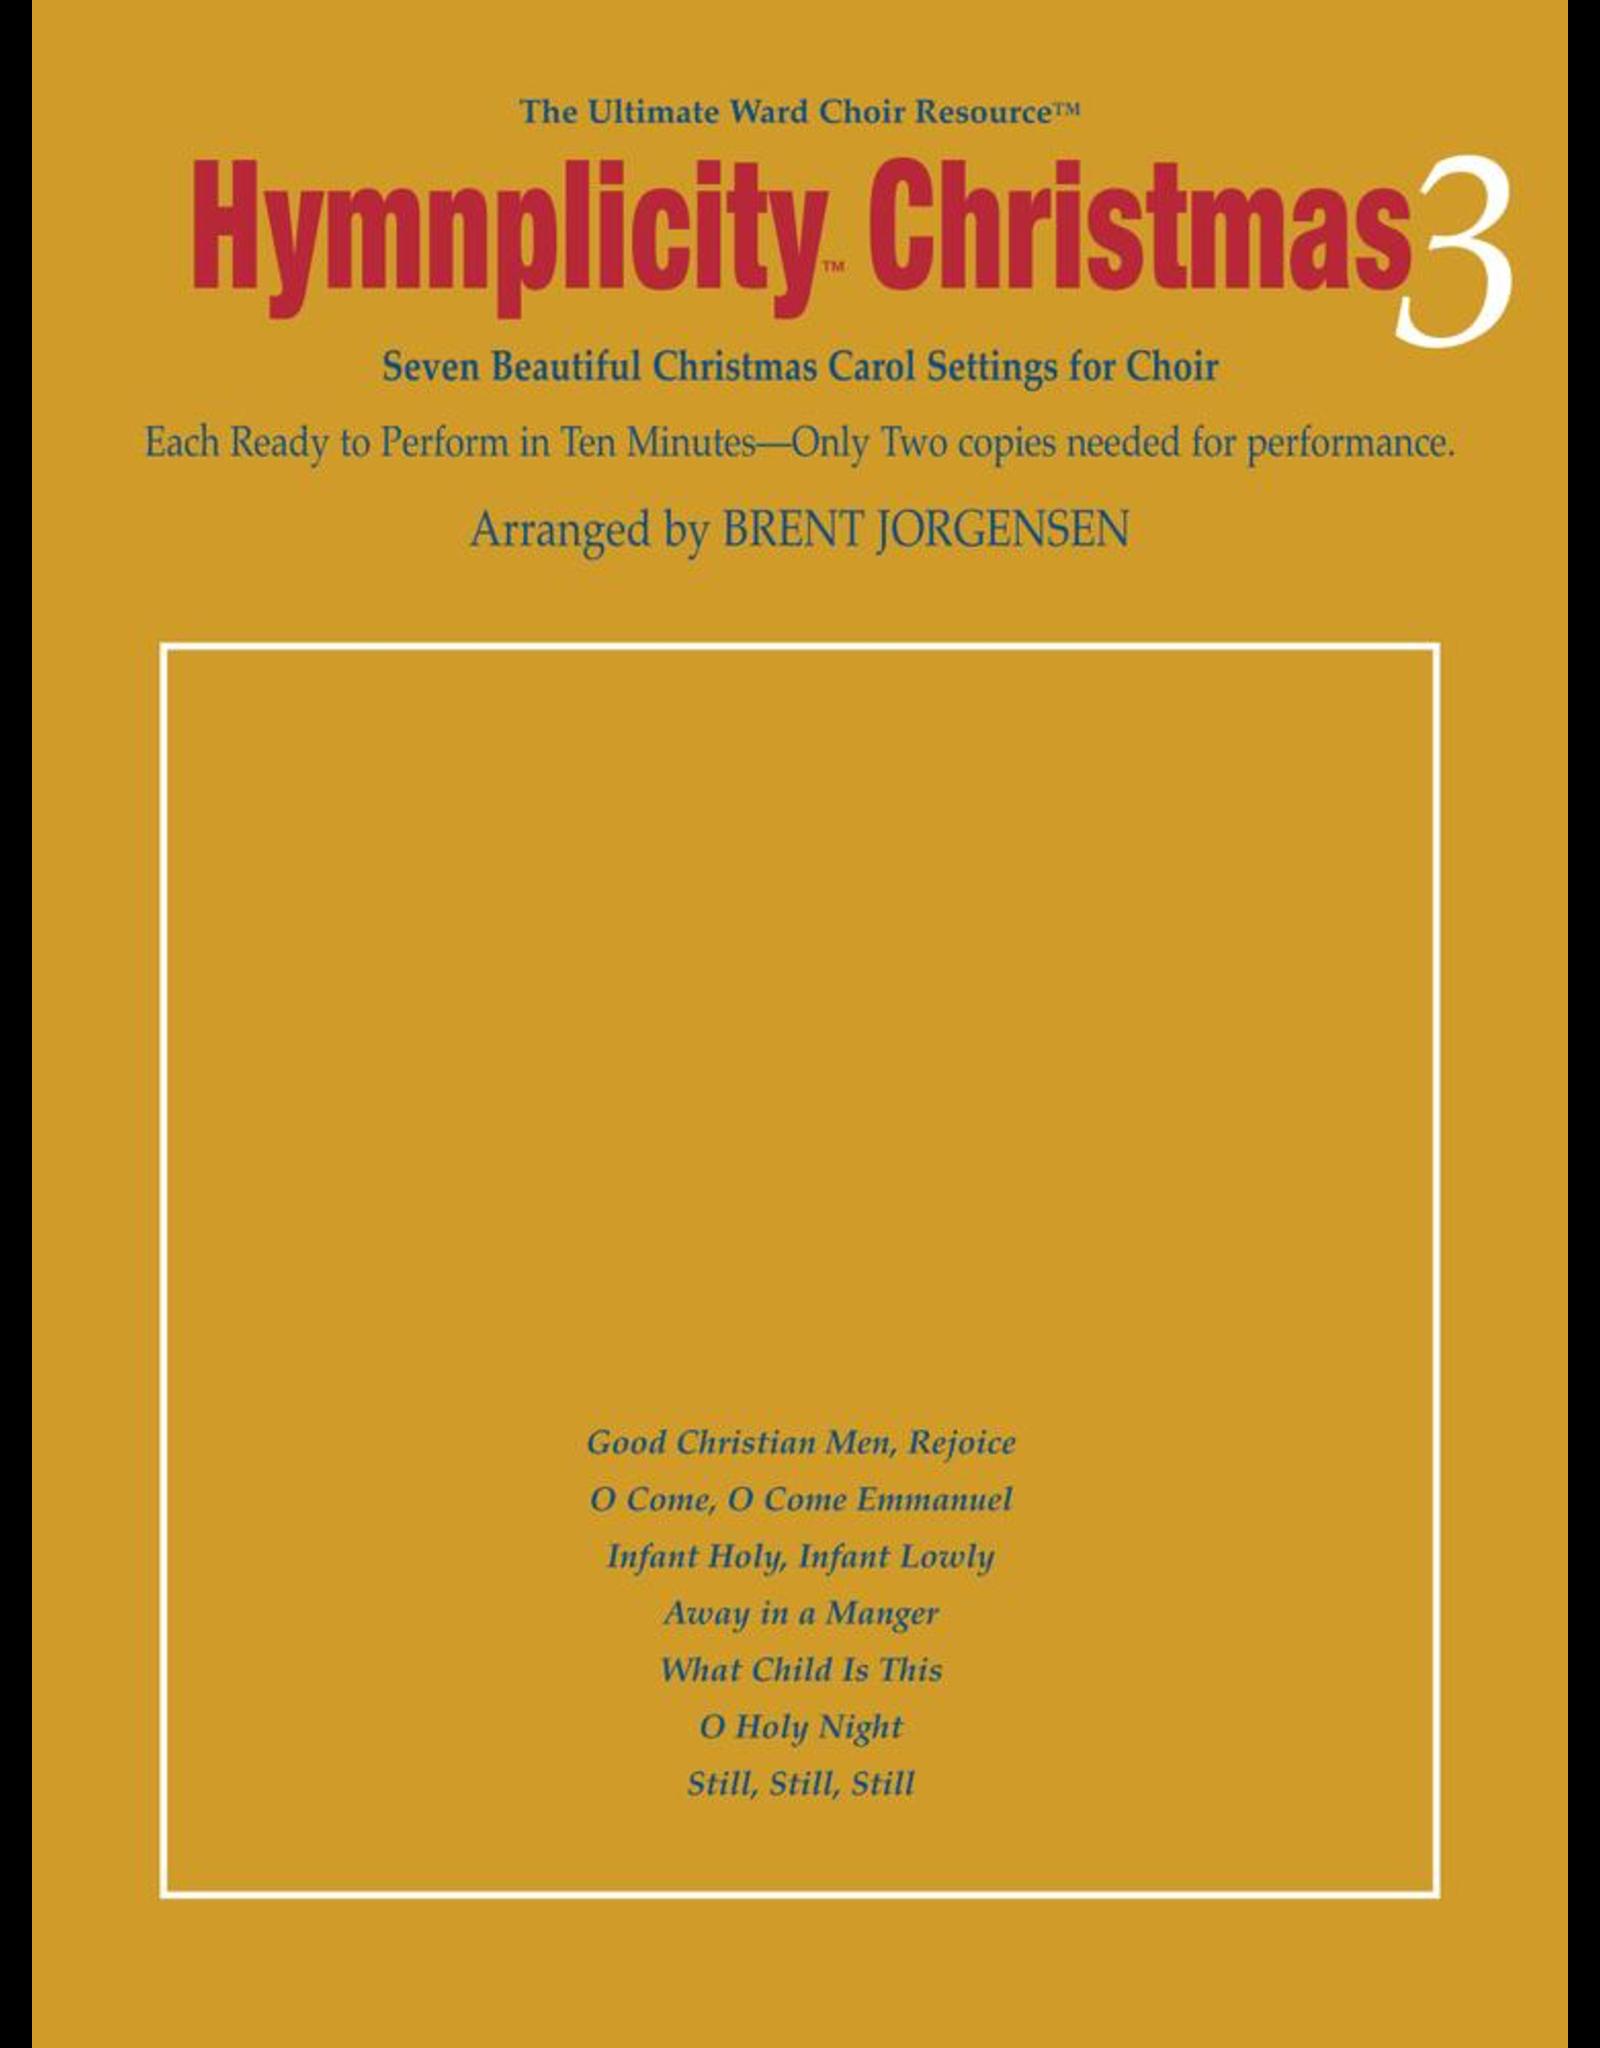 Jackman Music Hymnplicity Christmas, Book 3